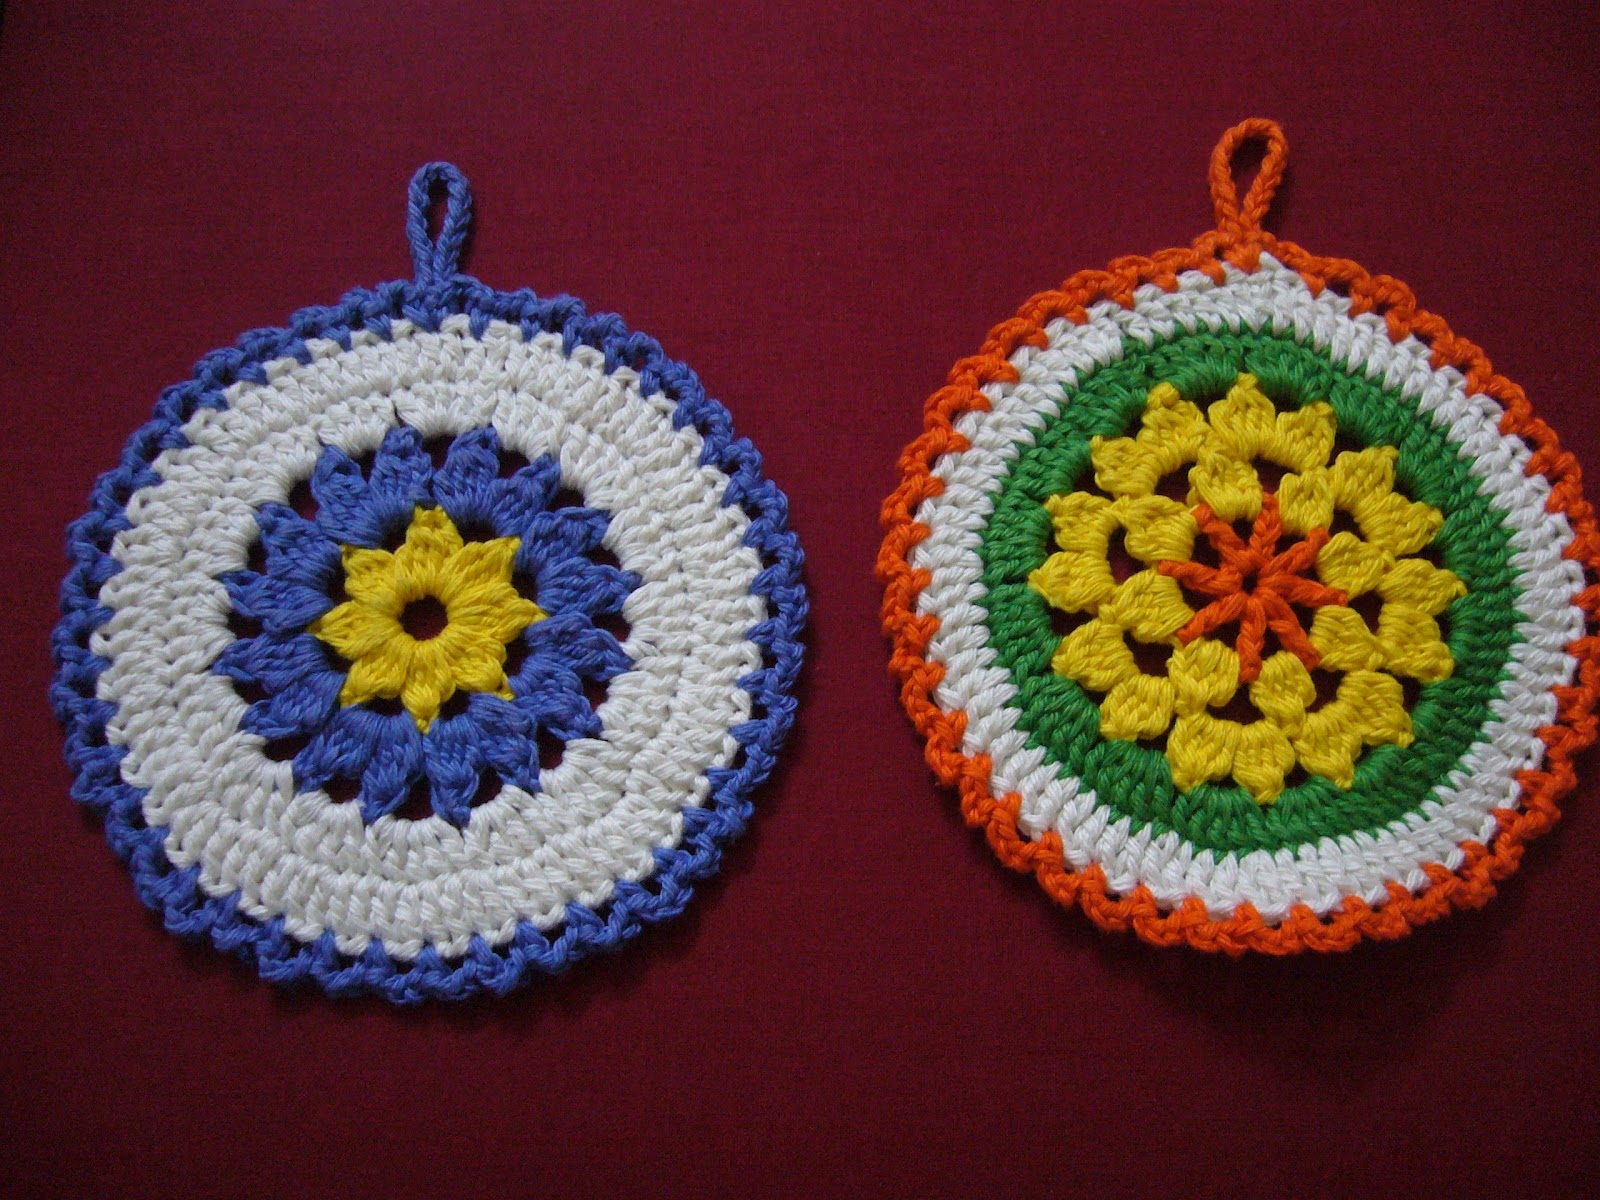 Crochetkari: New Things